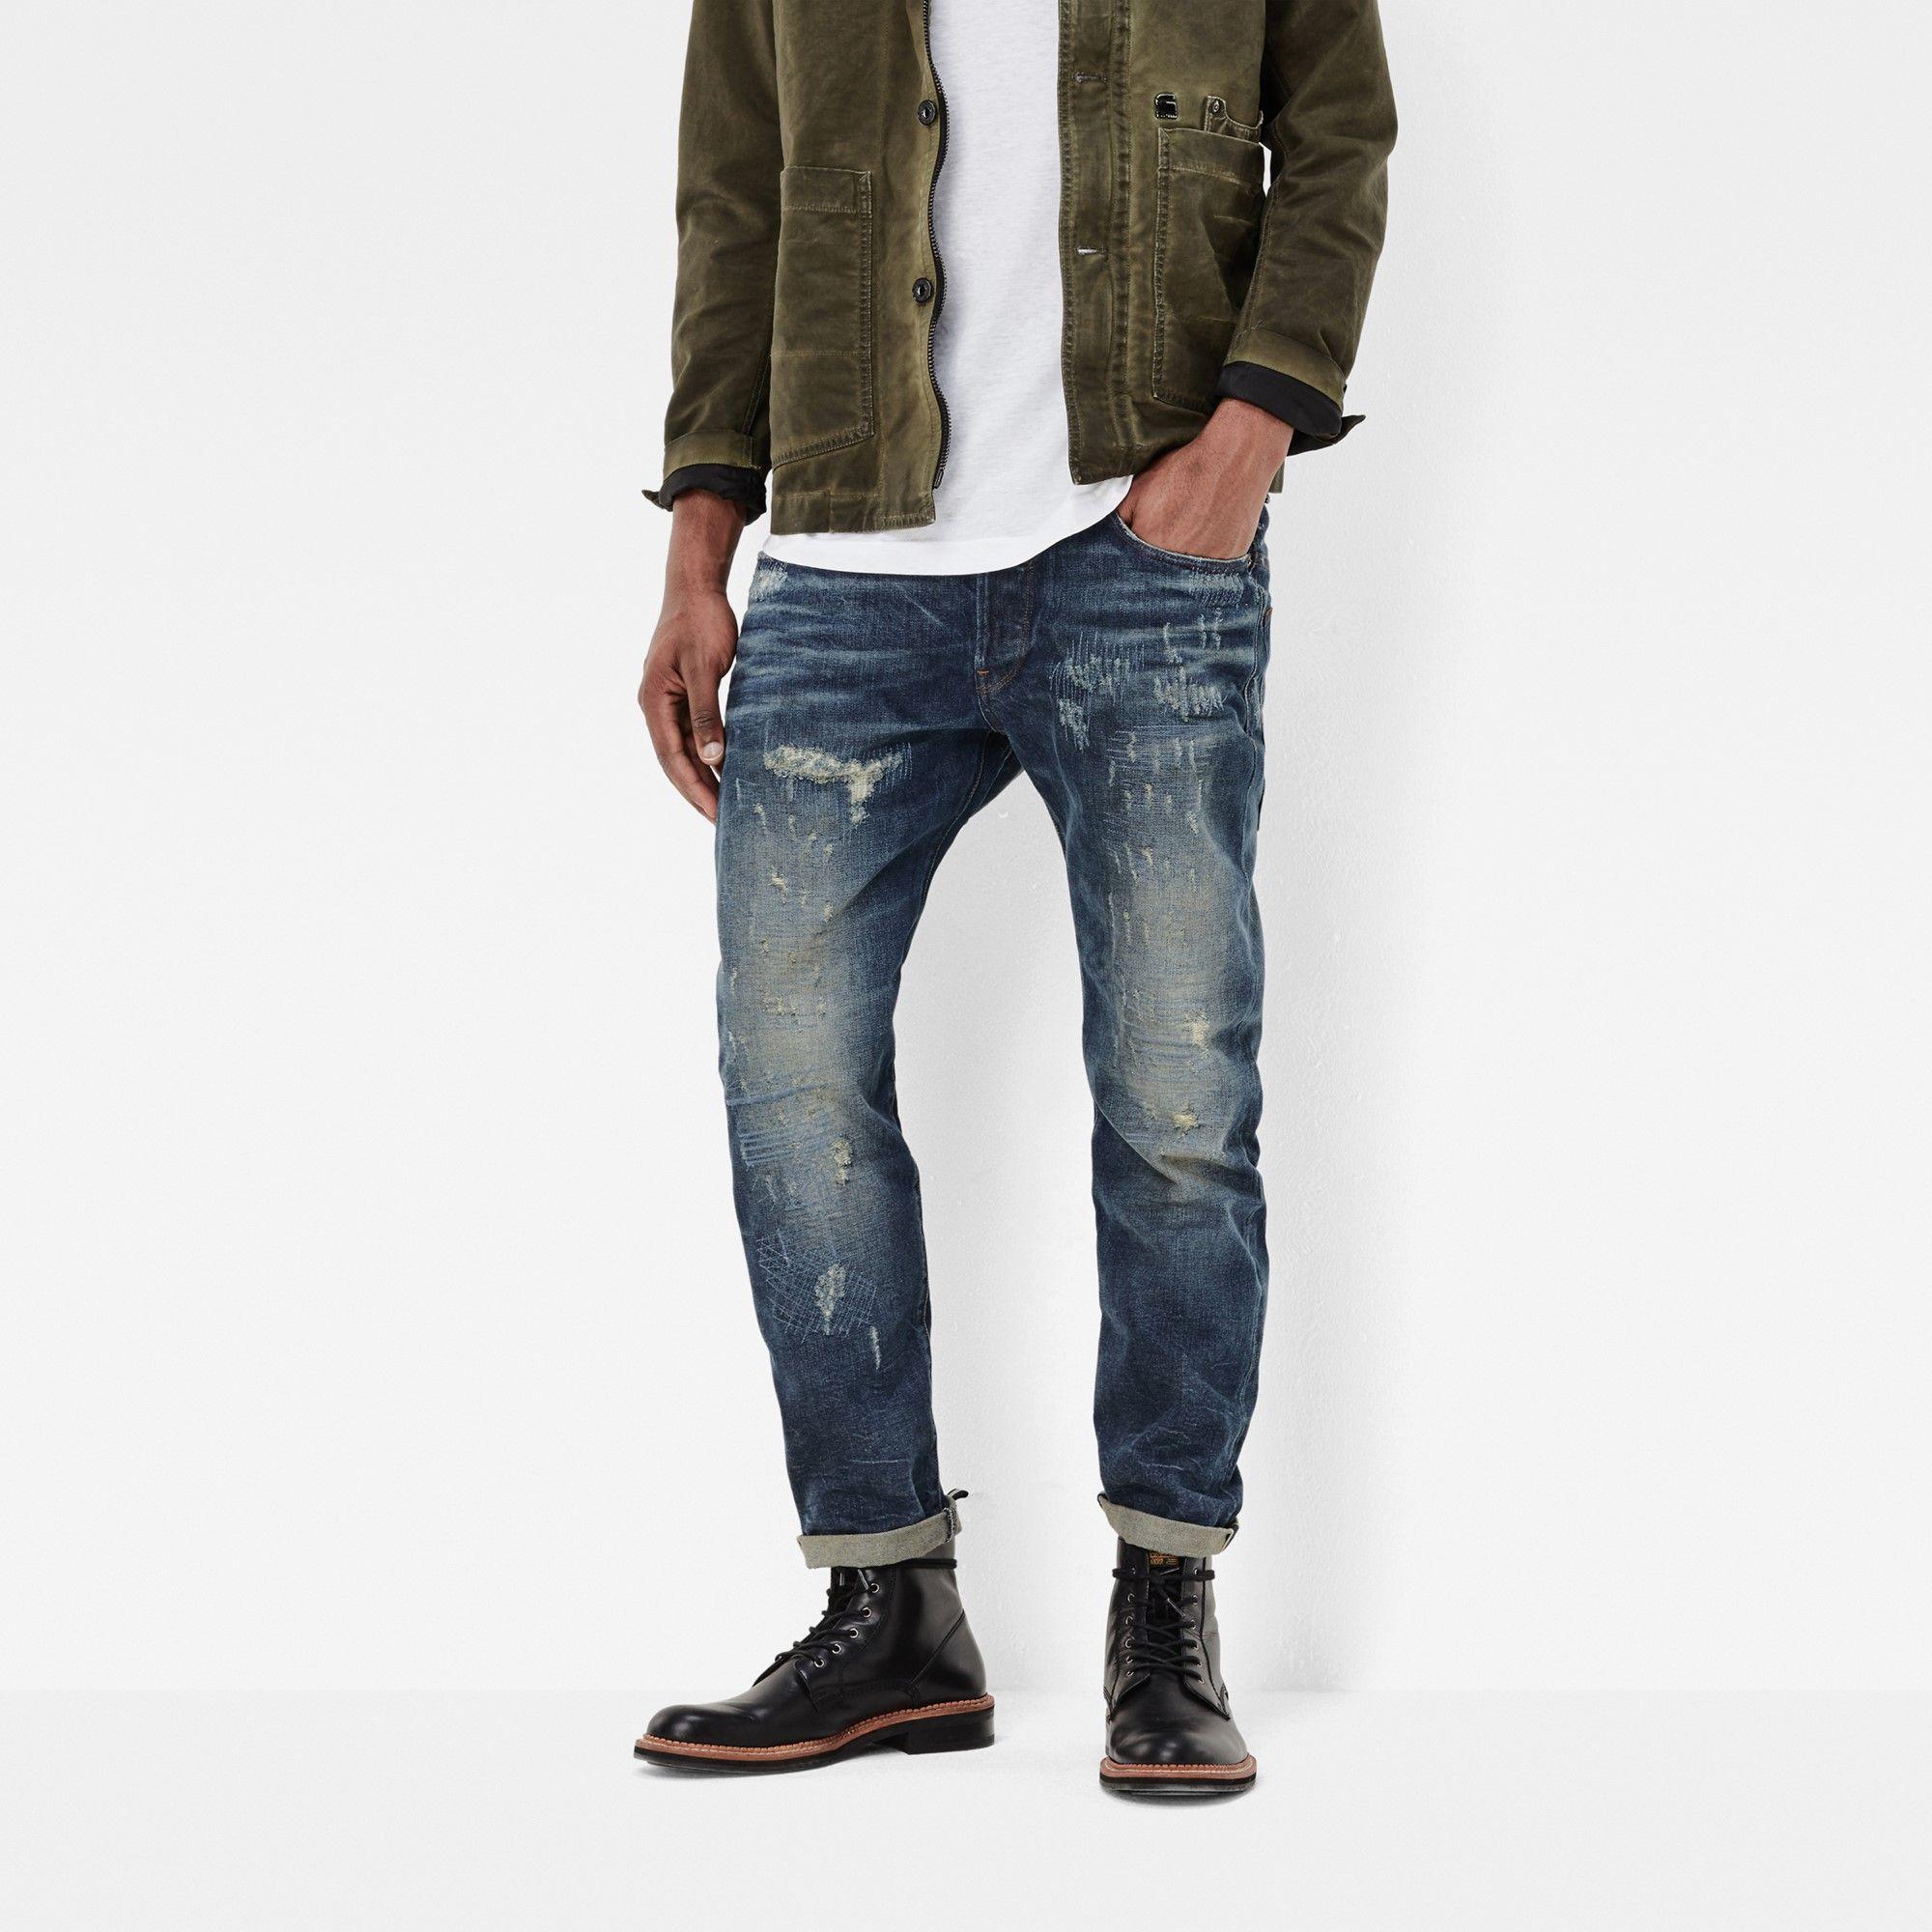 32470f0efc2 G-Star RAW | Men | ジーンズ | Us Lumber Classic Tapered Red Listing Jeans ,  Medium Aged Restored 54